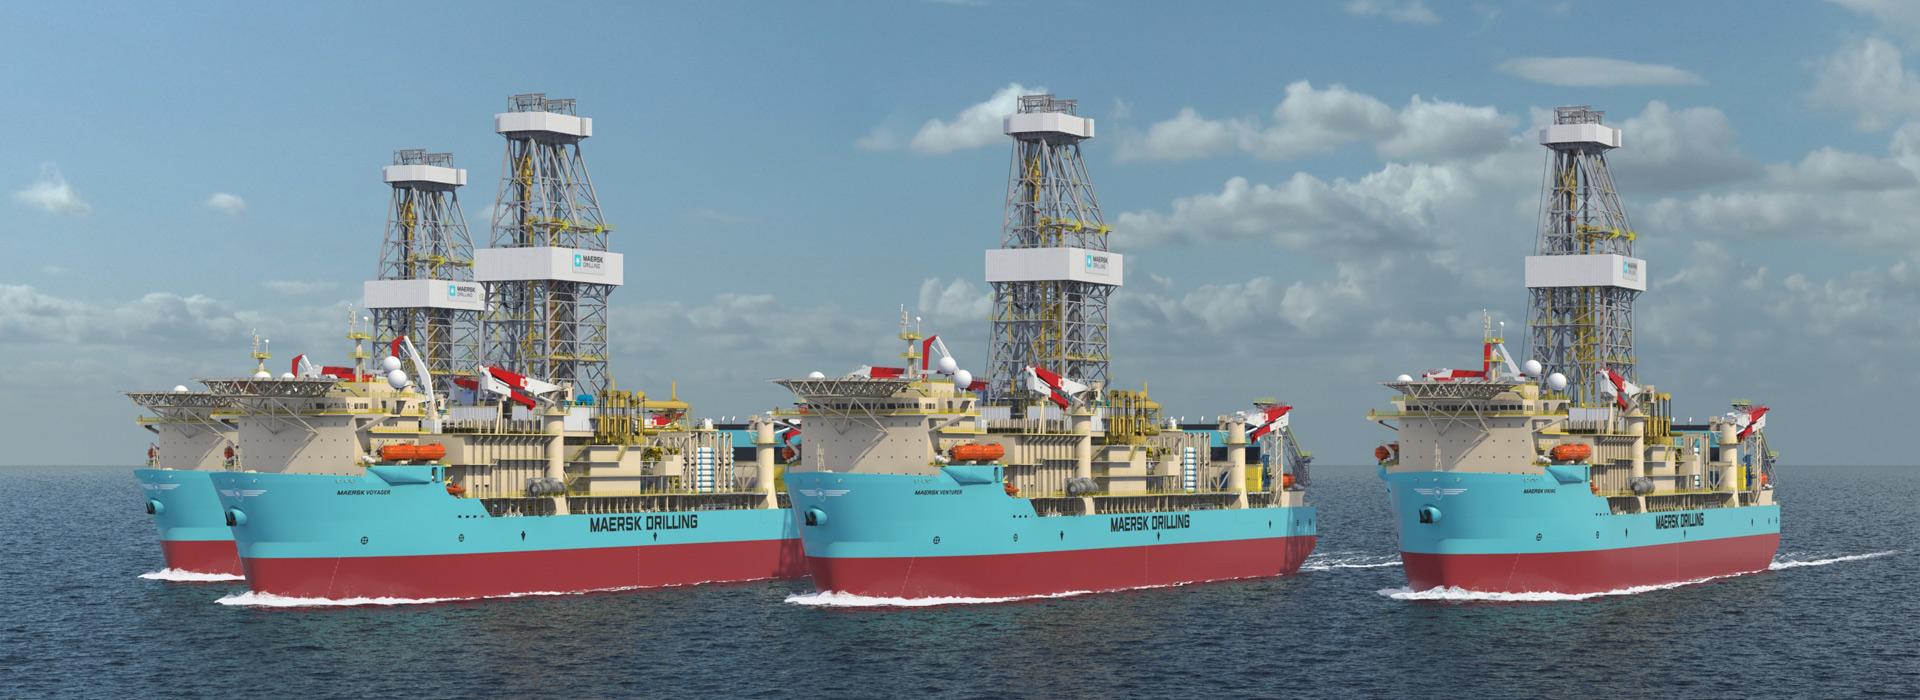 Maersk-Drilling